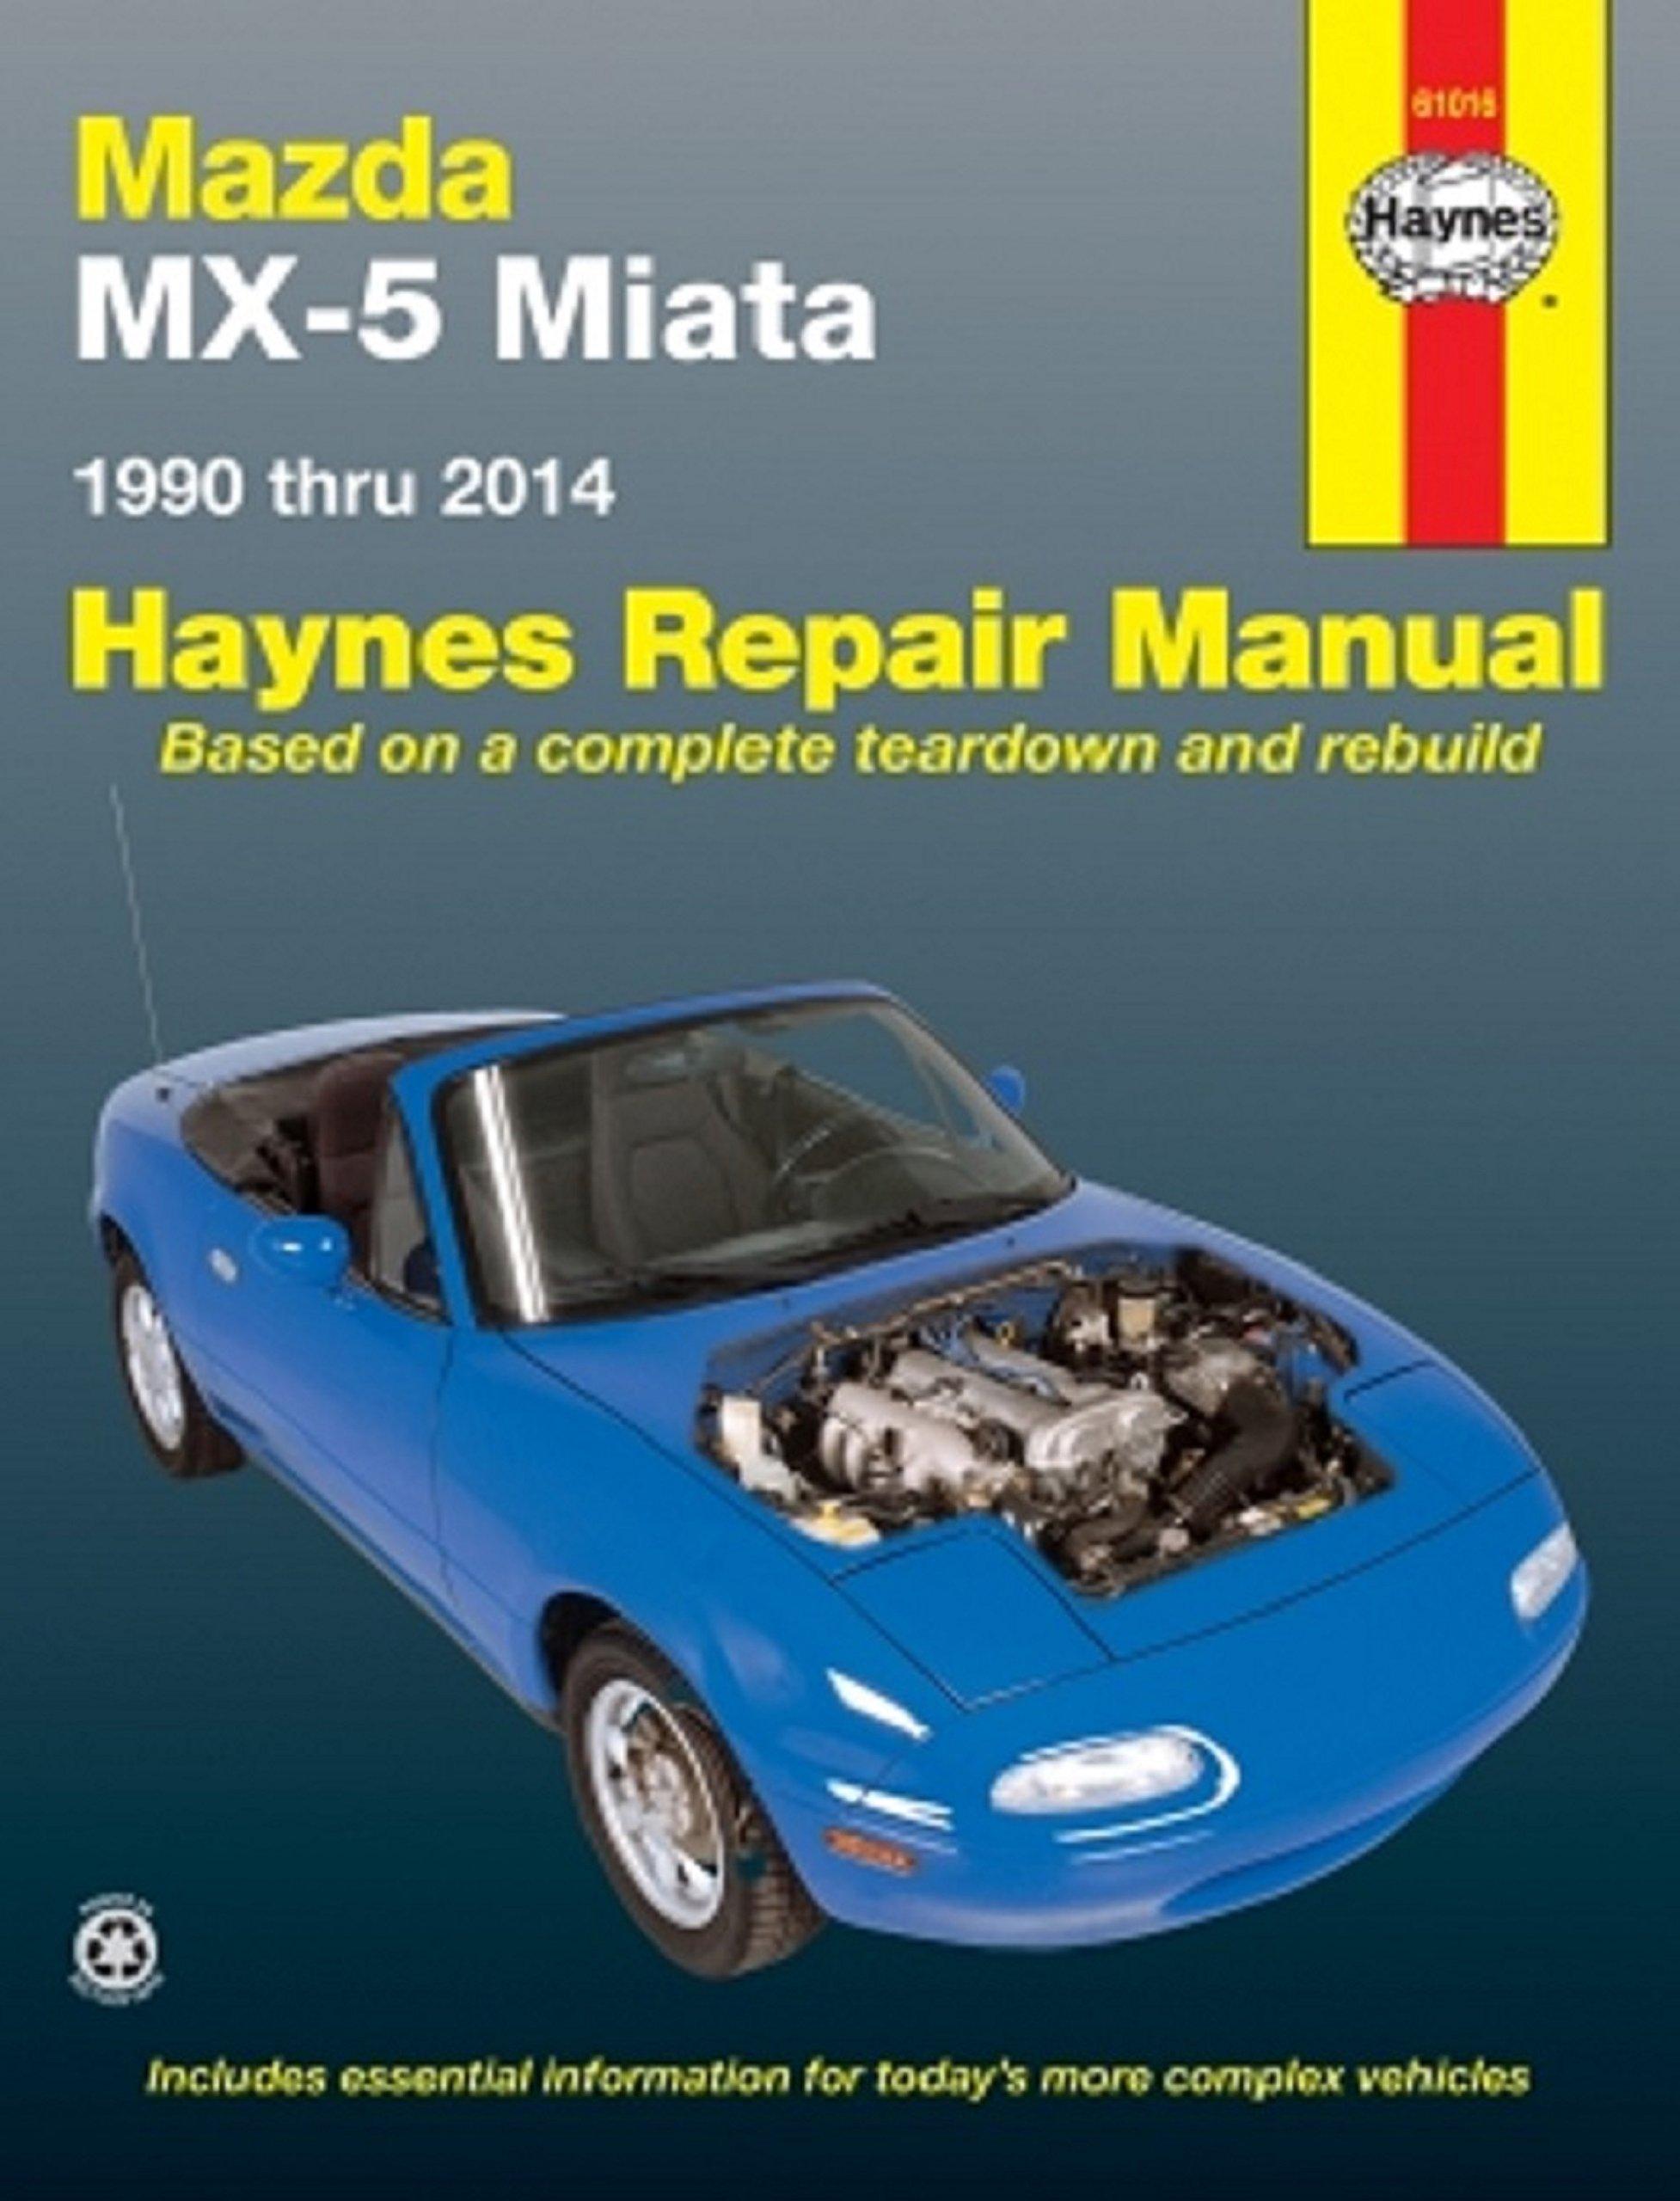 Mazda MX5 Miata models (90-14) (Haynes Repair Manuals) 1st Edition: John  Haynes: 9781563922893: Books - Amazon.ca